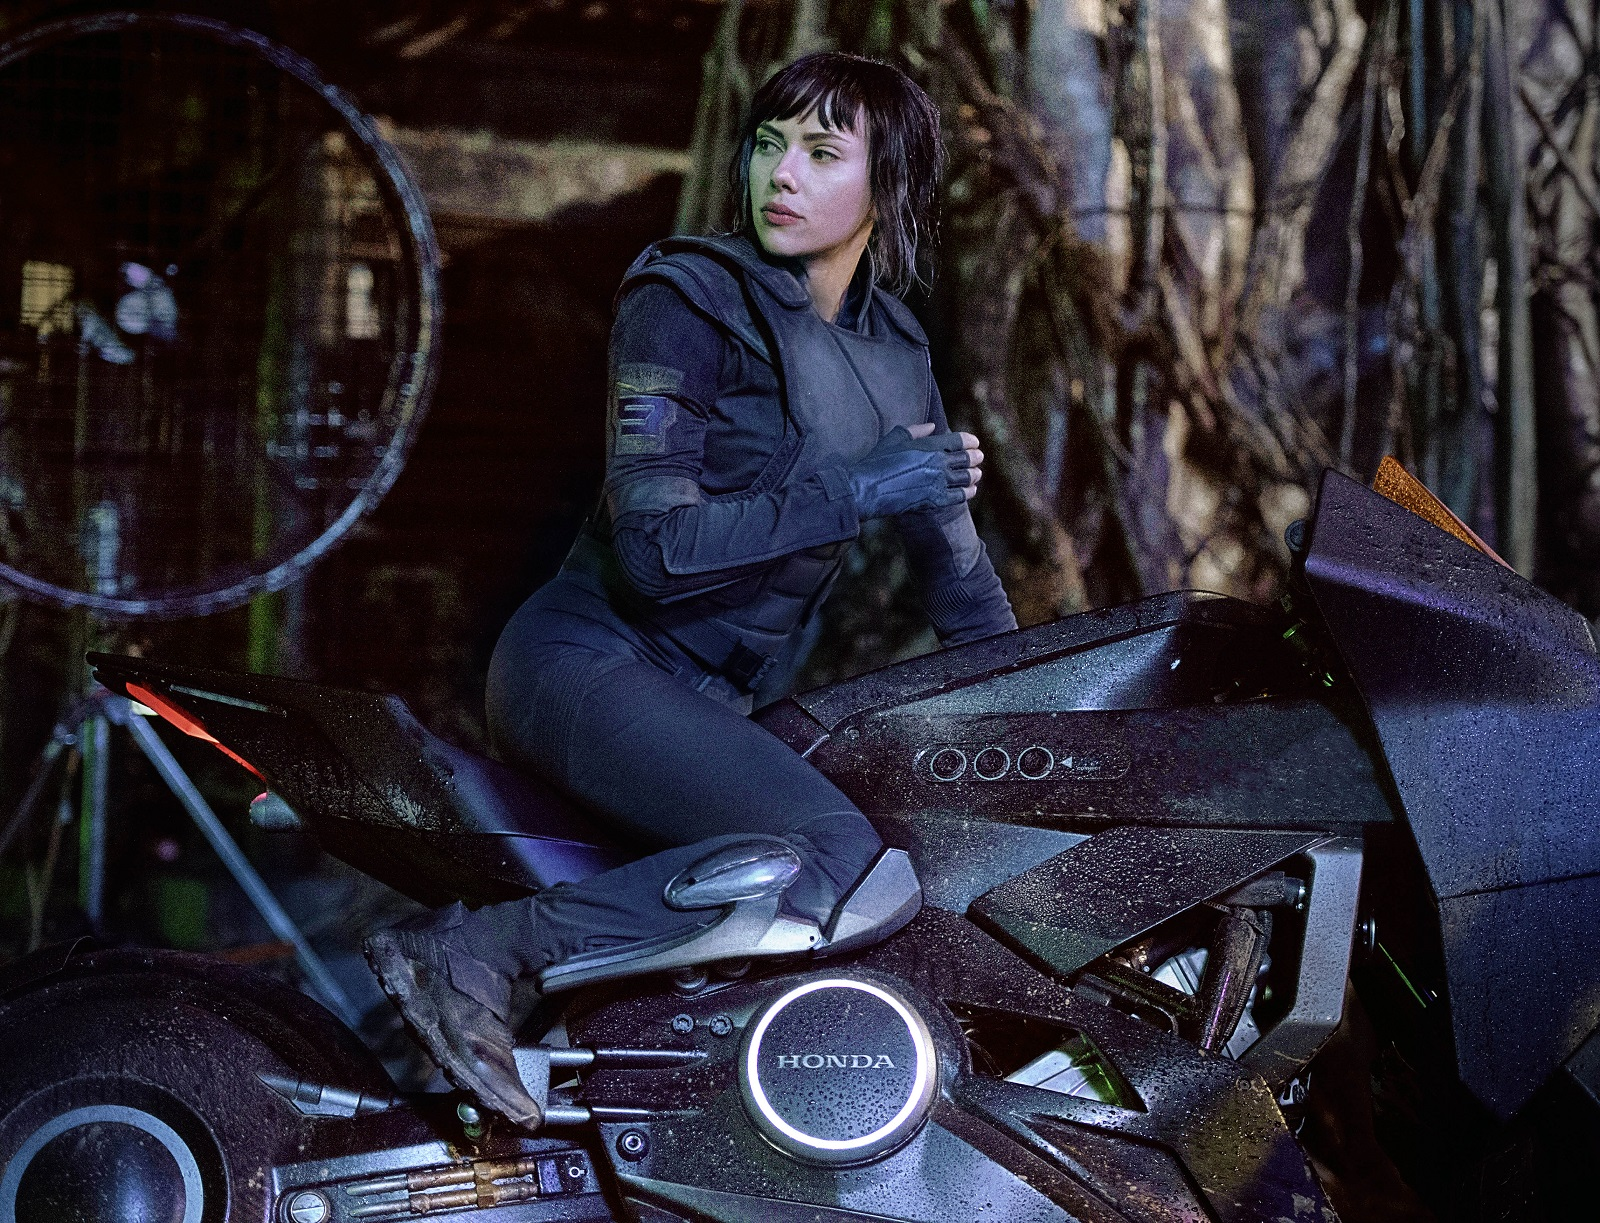 Scarlett_Johansson_Ghost_in_the_Shell_Honda_NM4_Concept_Moto-Mucci (1).jpg